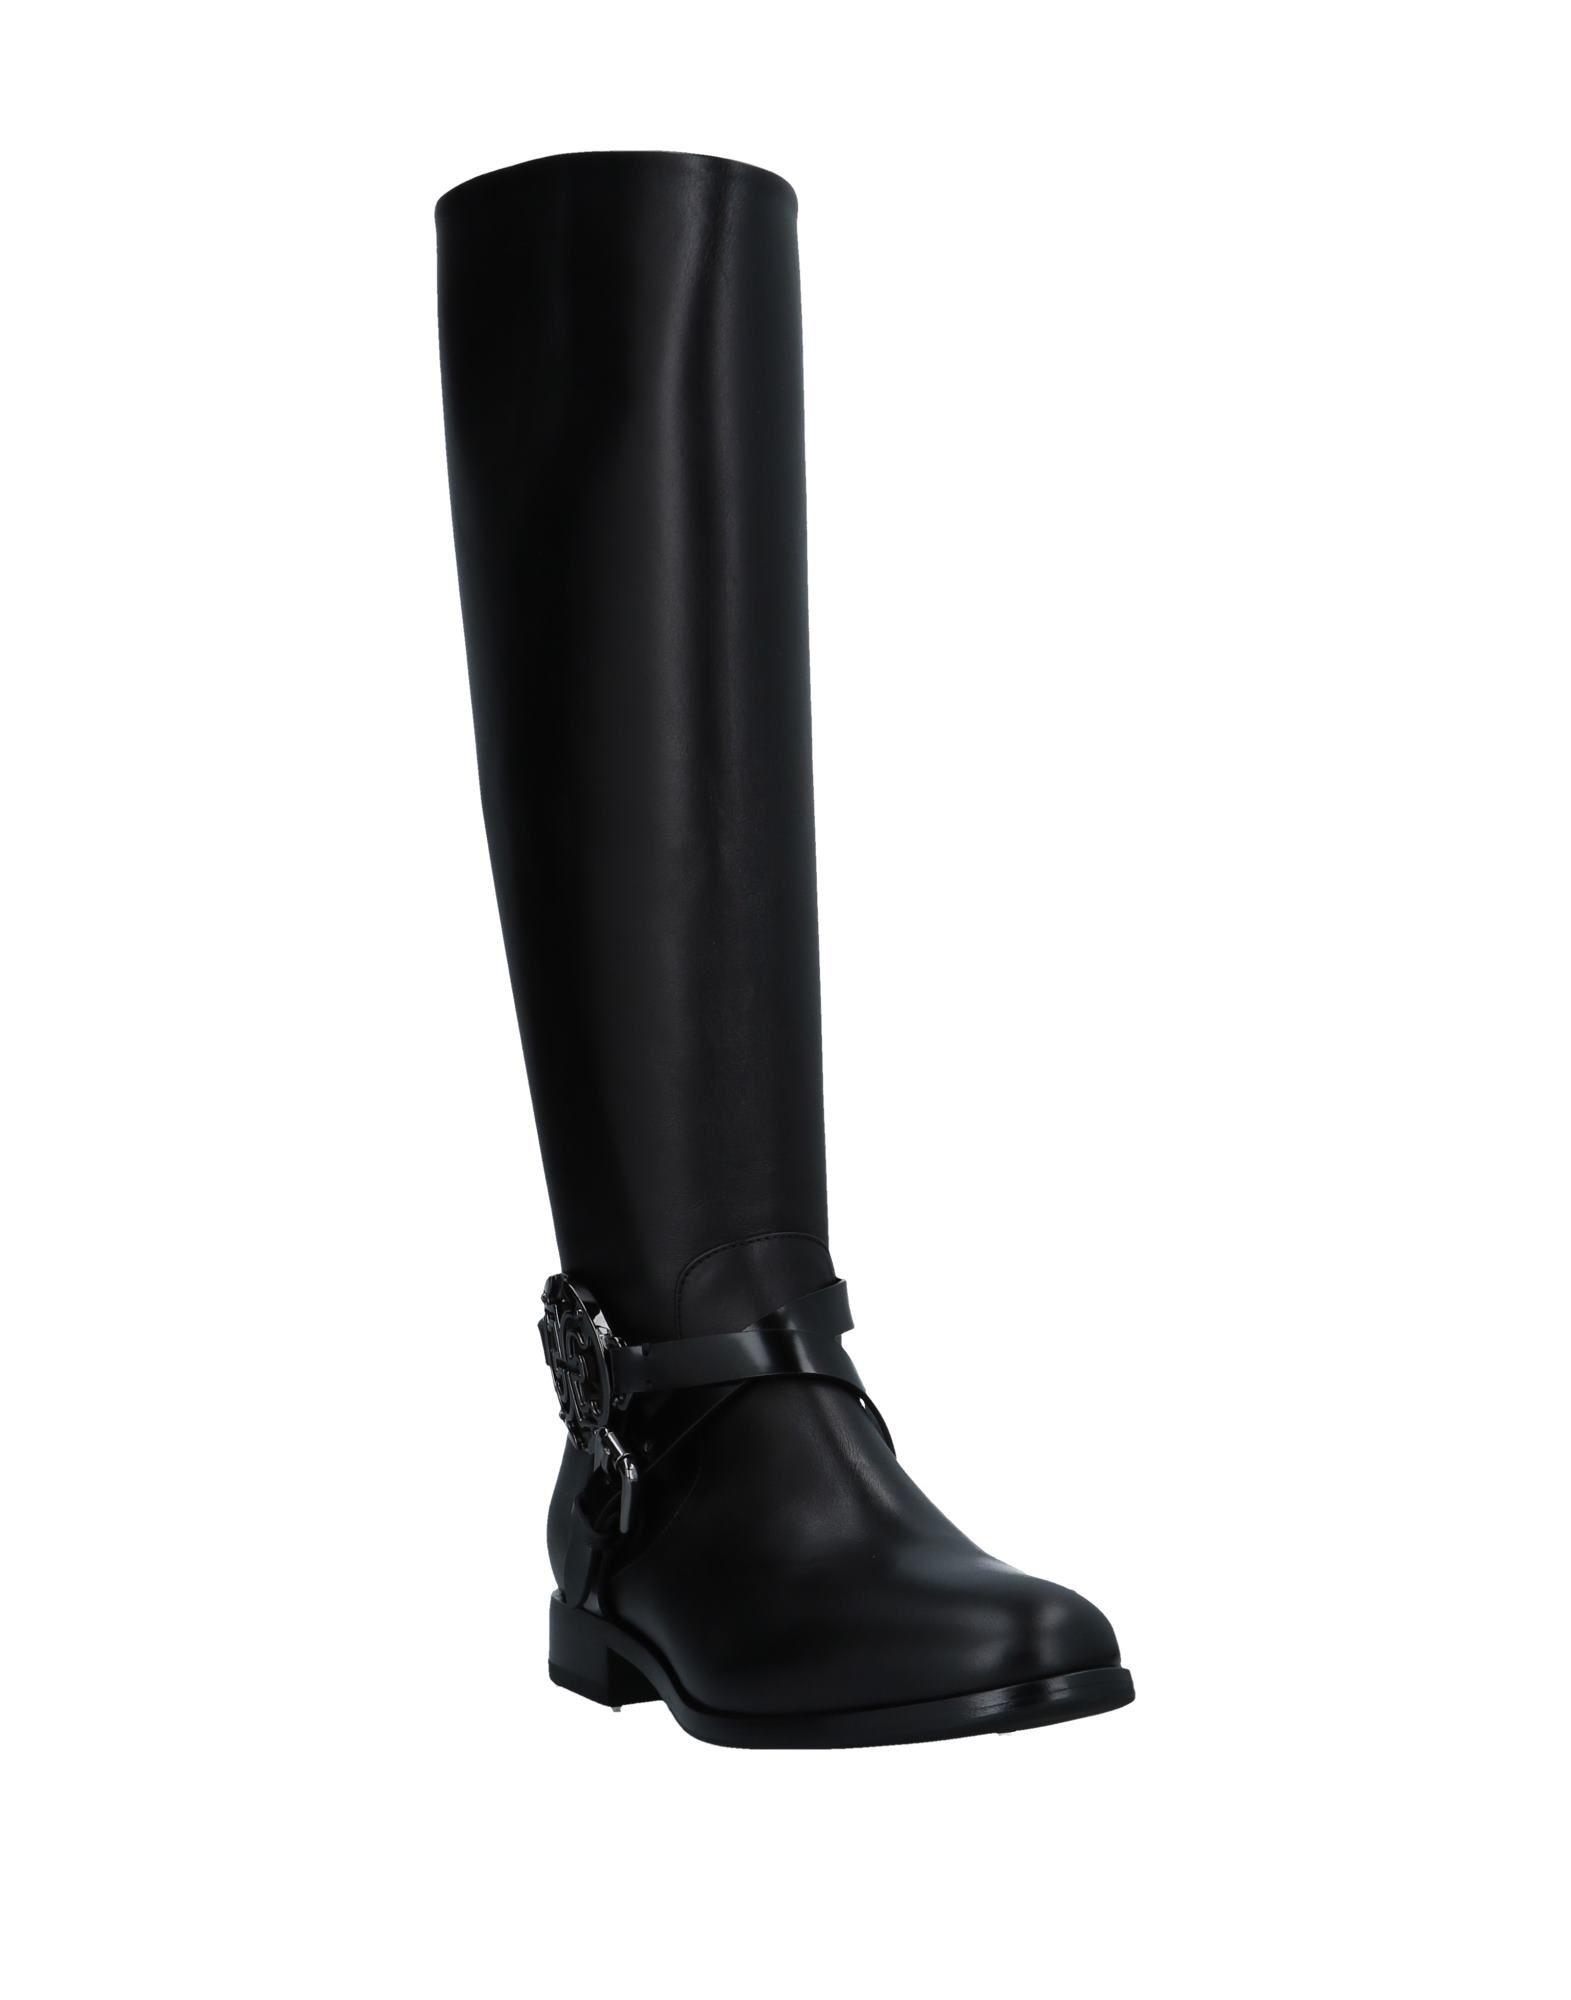 Moda Stivali Fabi Donna - 11535970MX 11535970MX - 14bcb7